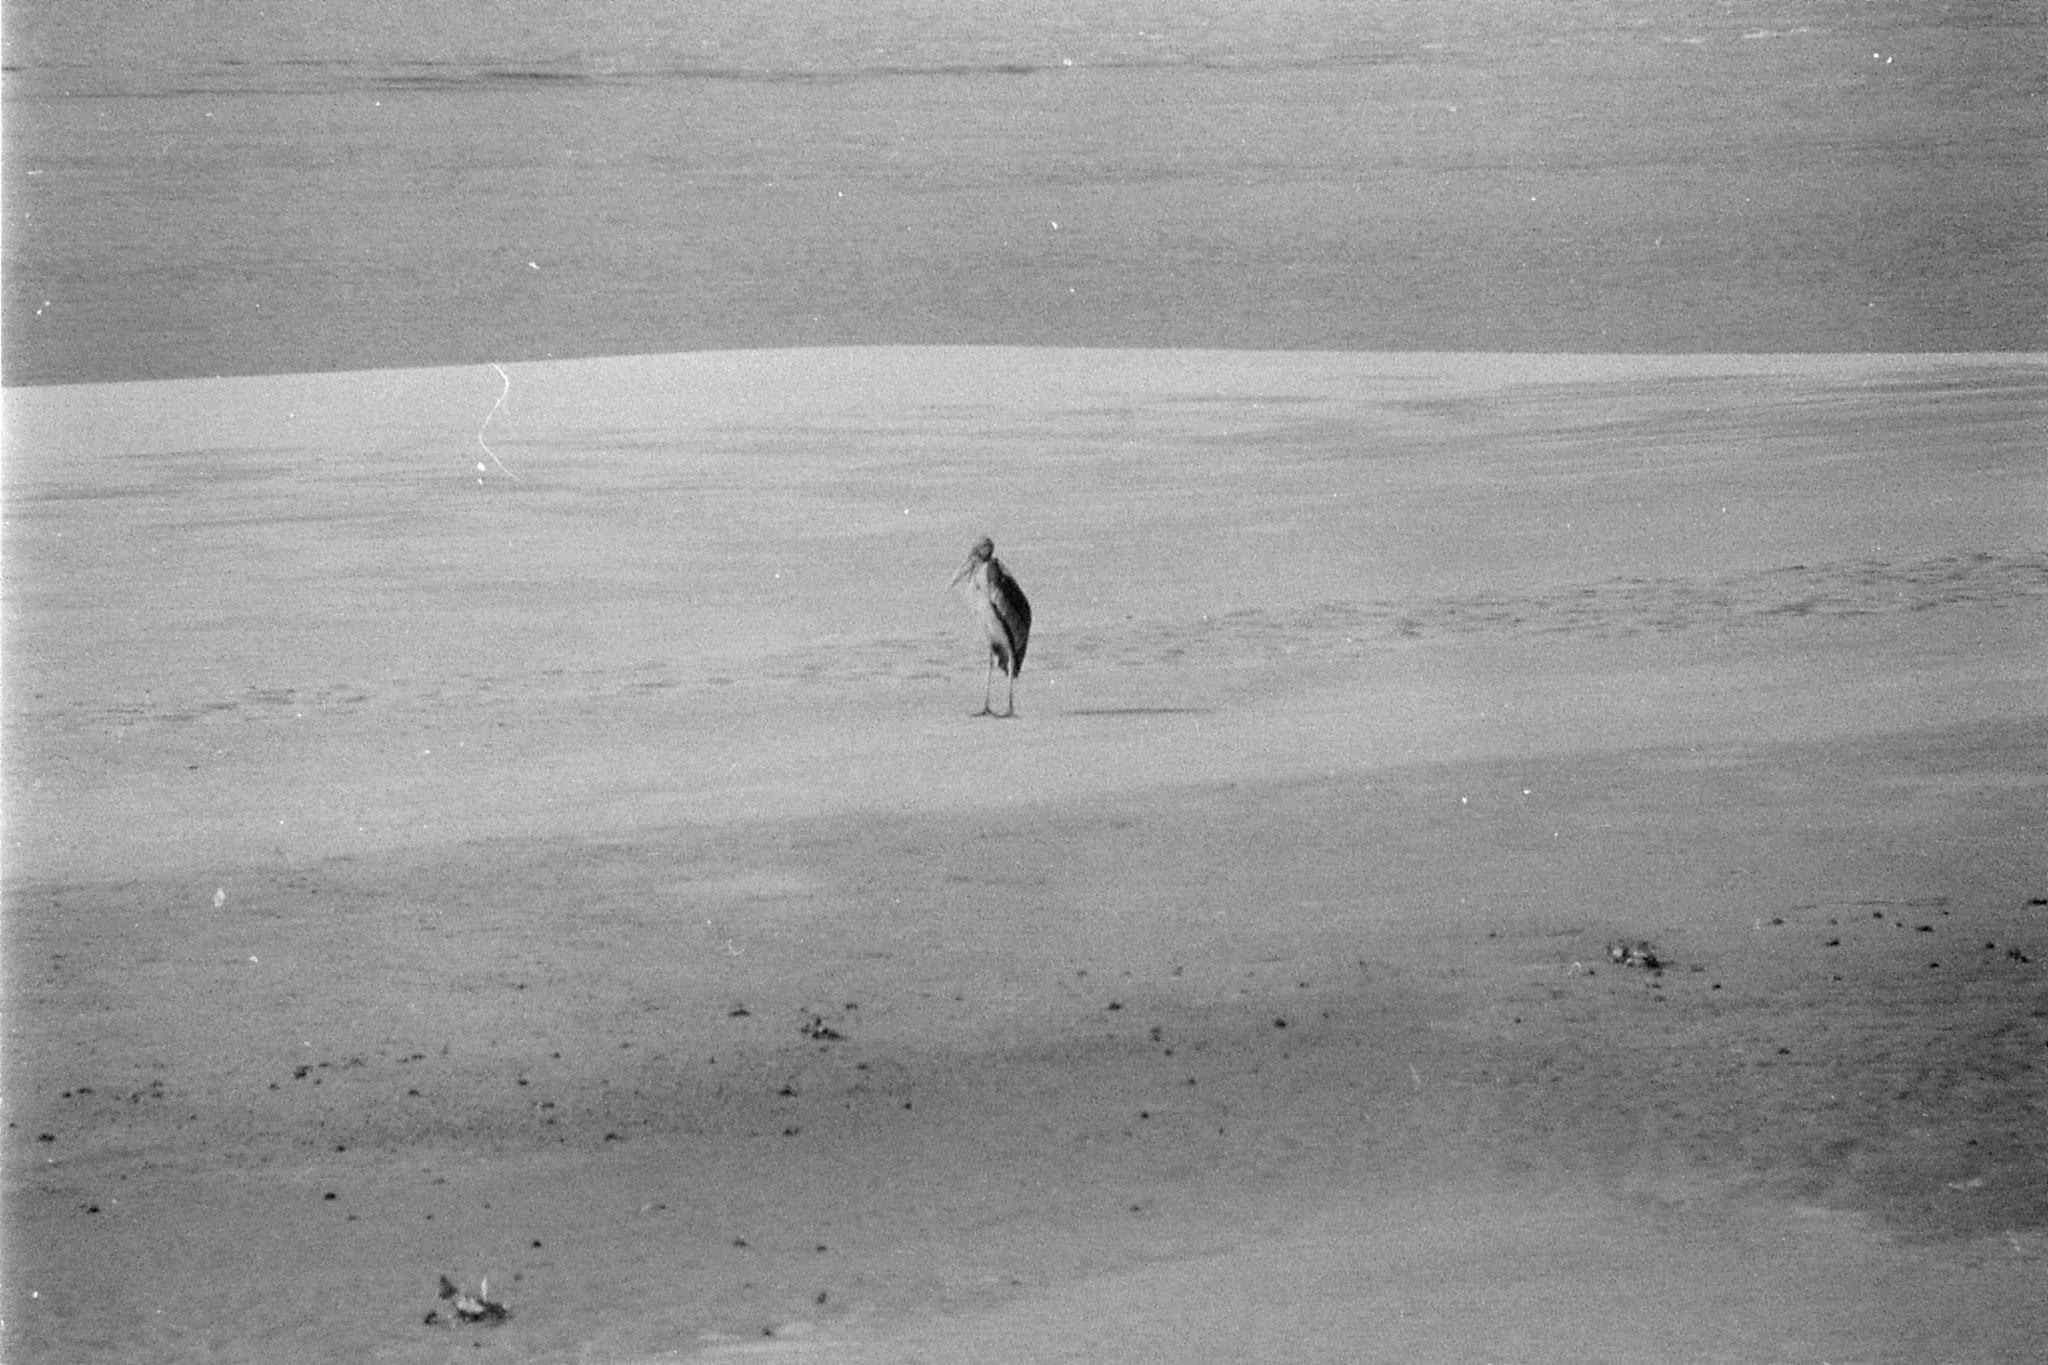 10/4/1990: 30: Gauhati, Brahmaputra River, Adjutant stork